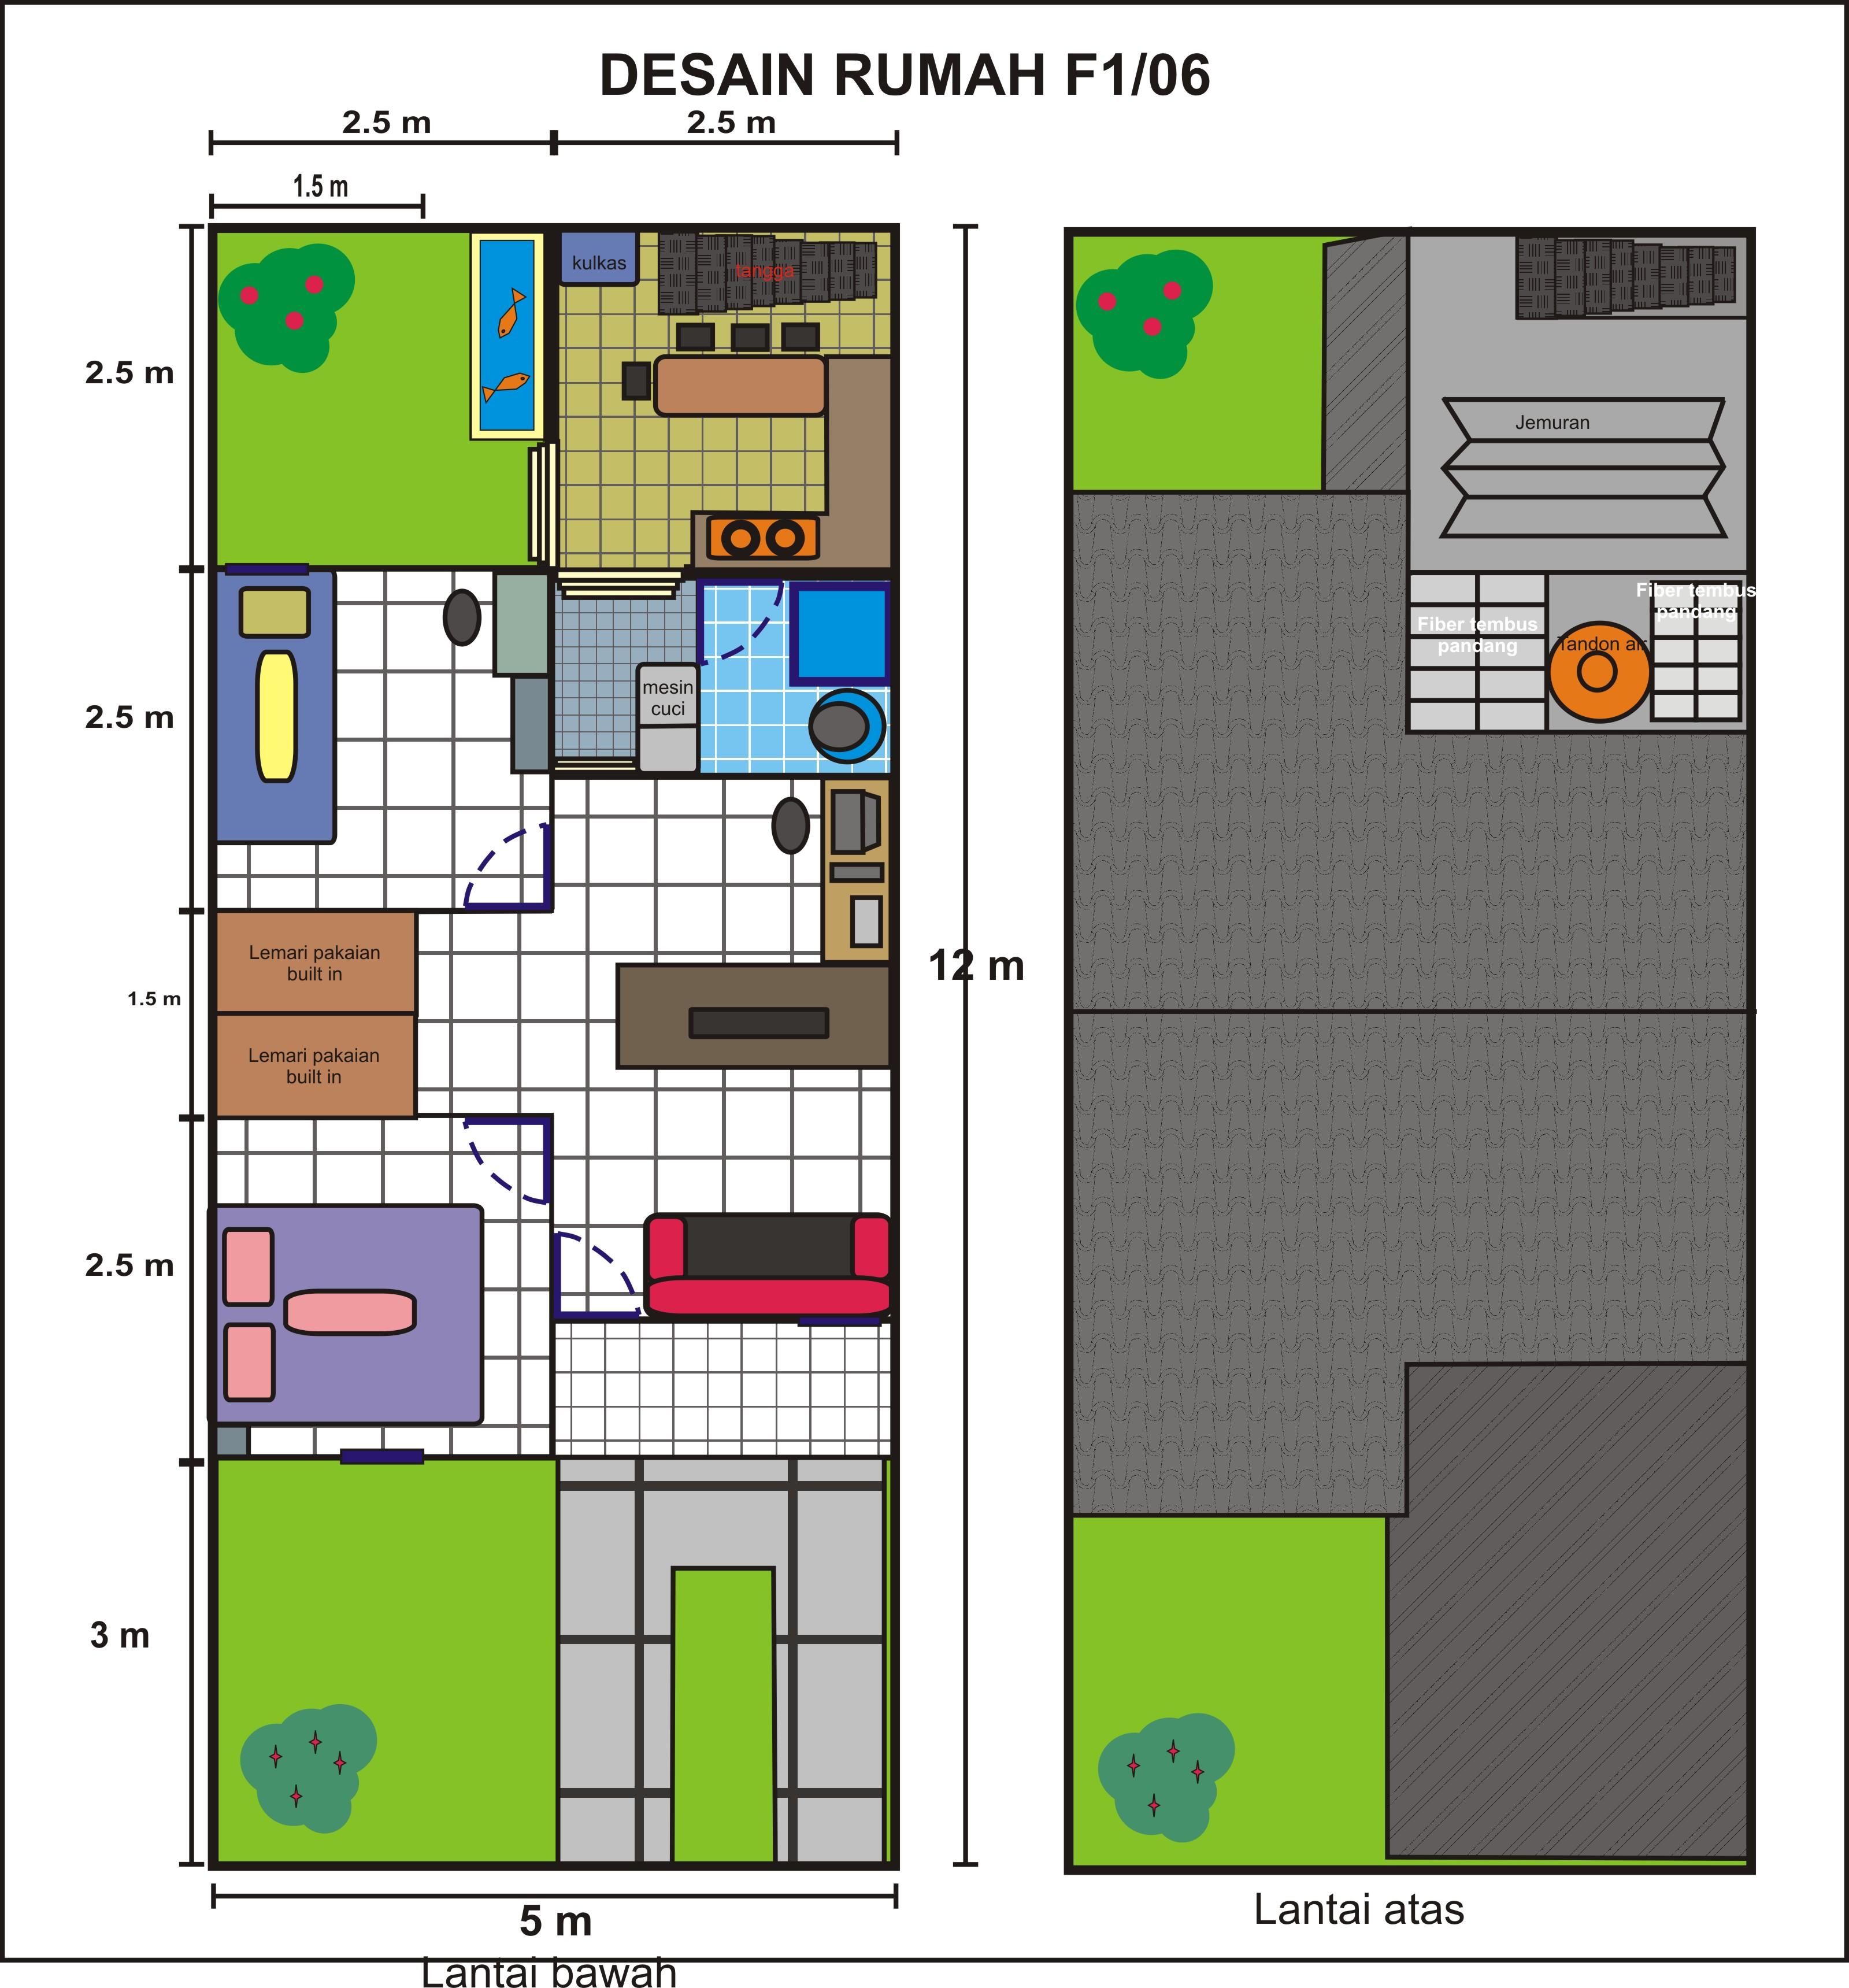 Pengembangan Rumah Di Lahan 5x12m2 Mindy Tangerang Aguscwid